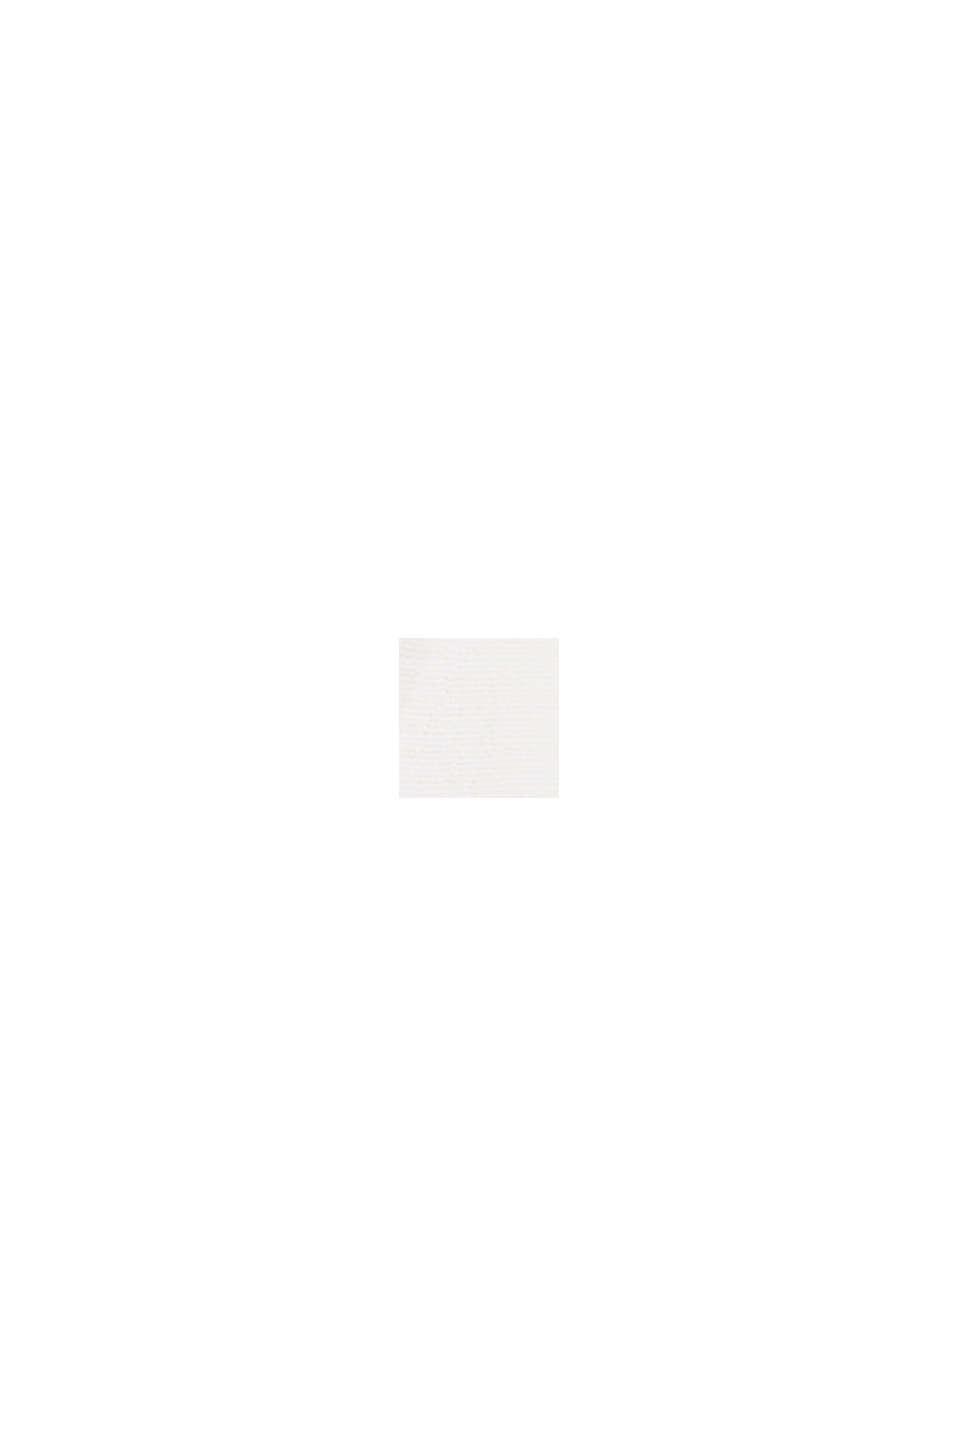 Blouse met ballonmouwen, LENZING™ ECOVERO™, OFF WHITE, swatch